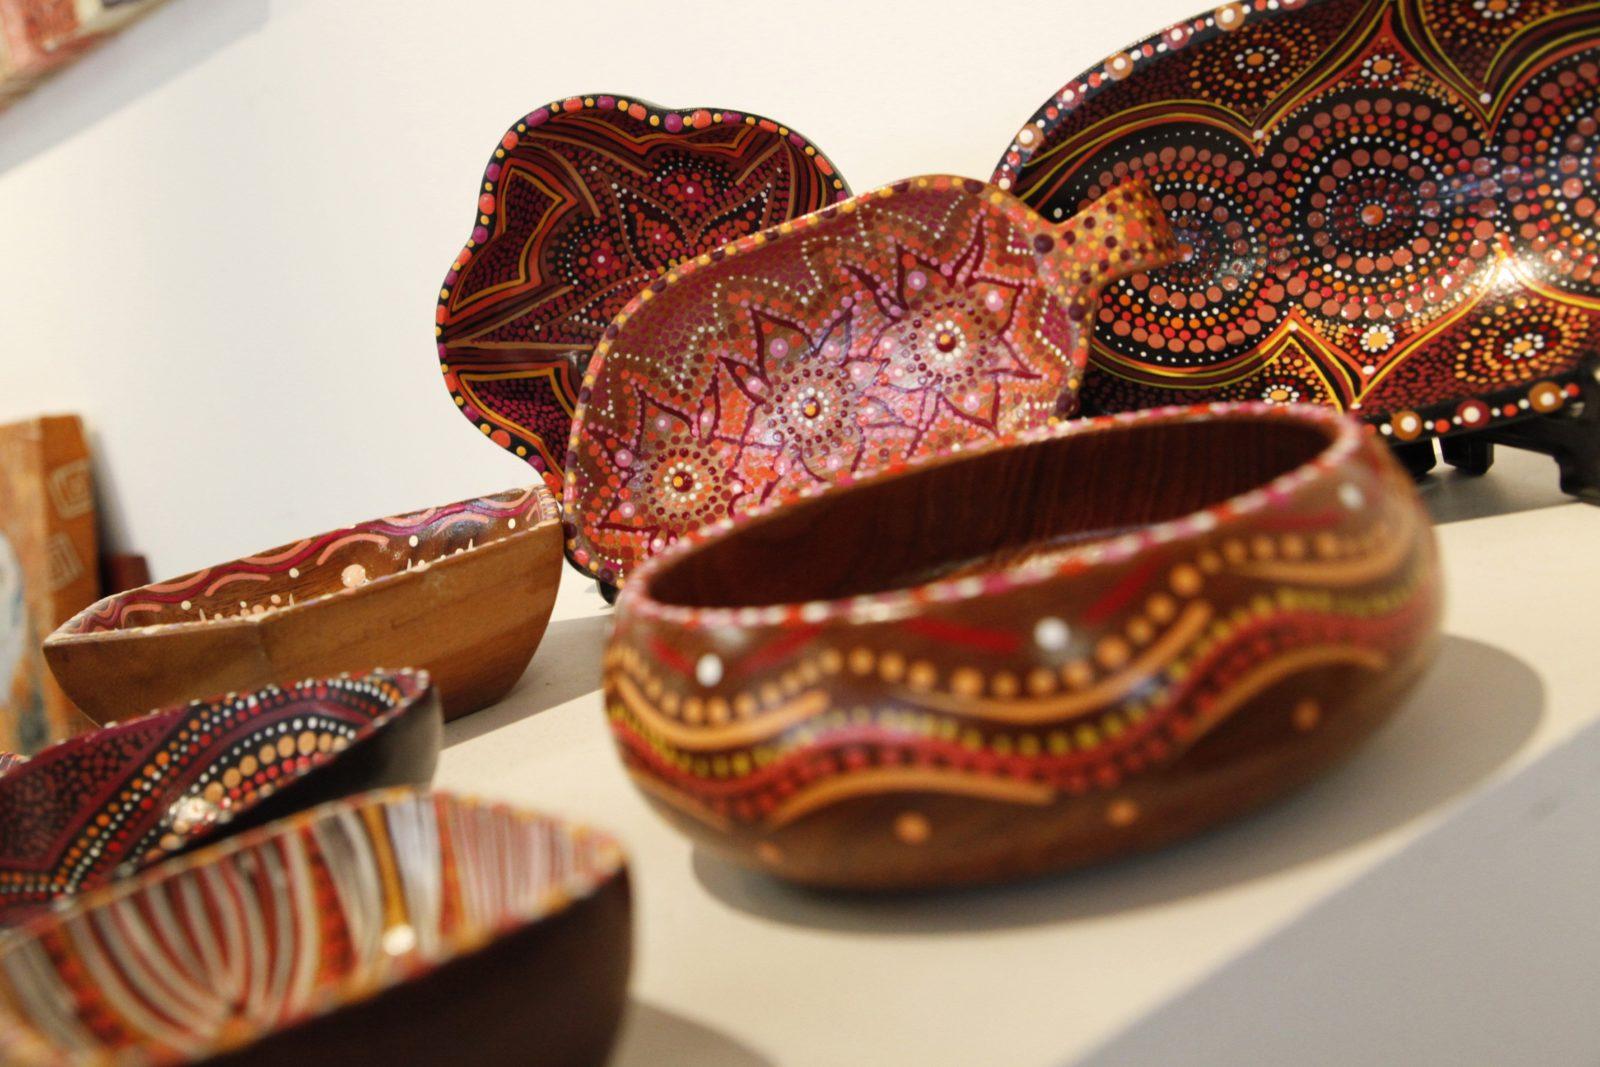 Handpainted wood ware